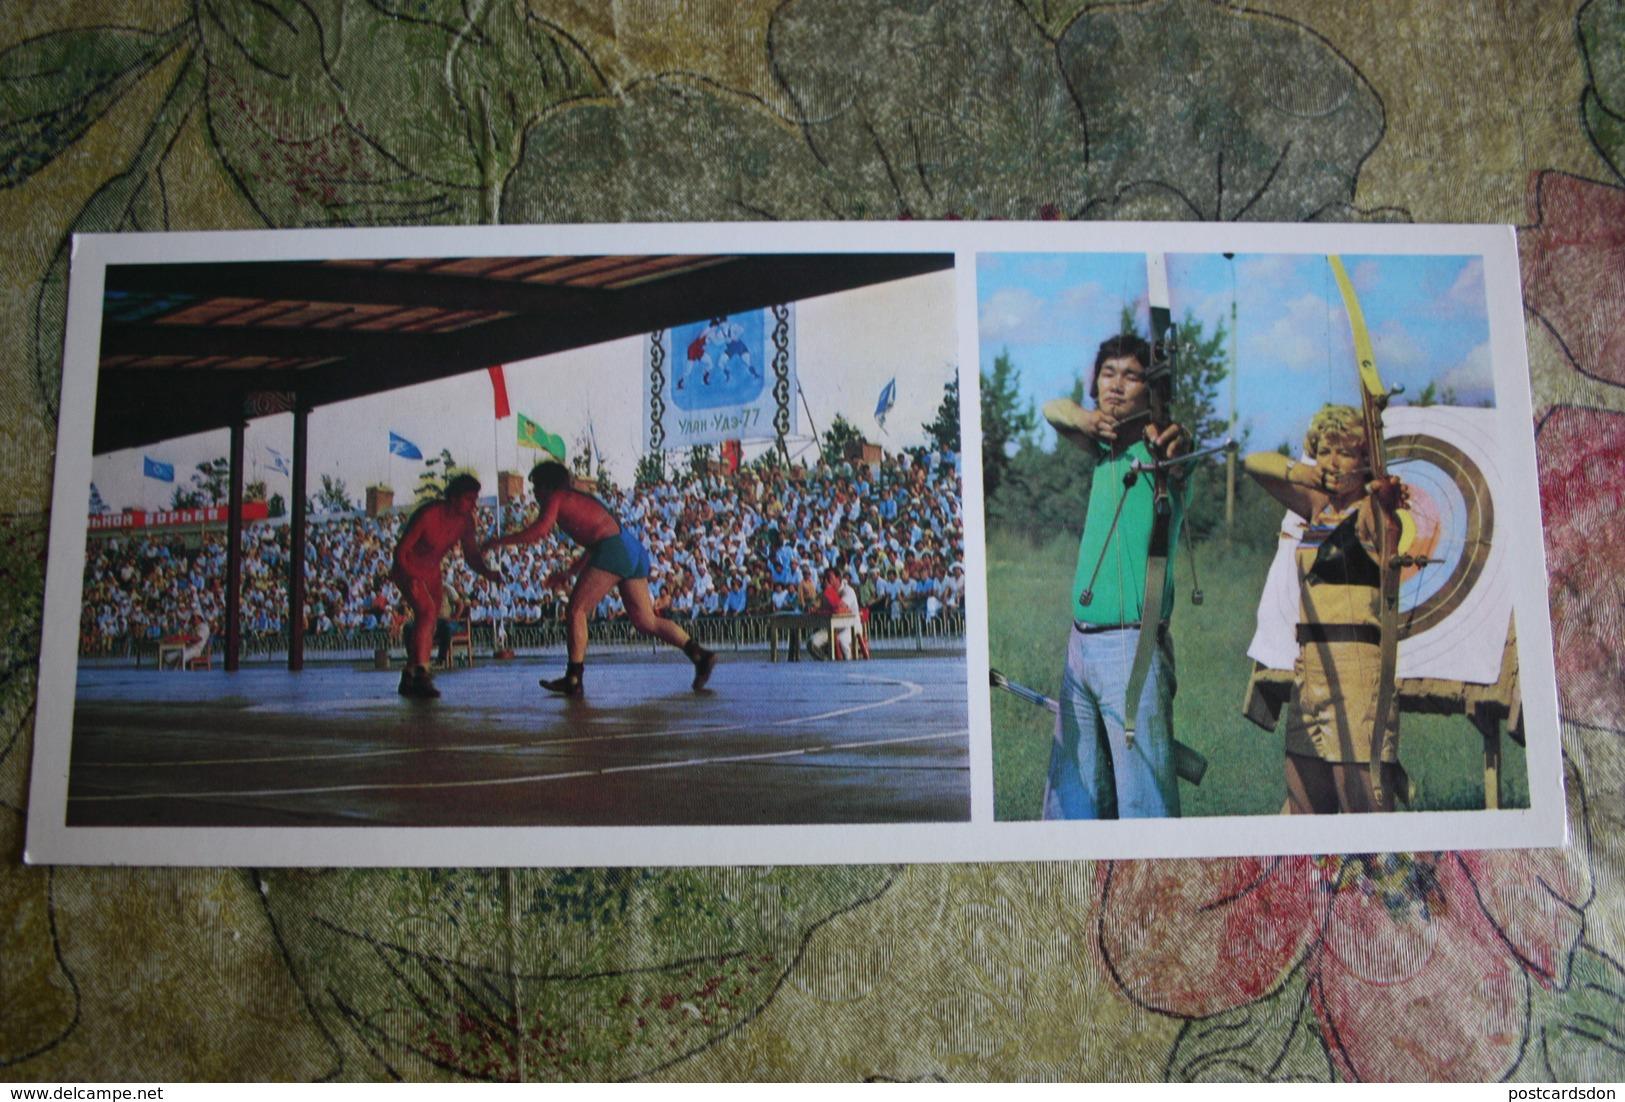 Old Postcard - ARCHERY - USSR Ulan Ude -  1978 ARCH - ARCHER - Tir à L'Arc